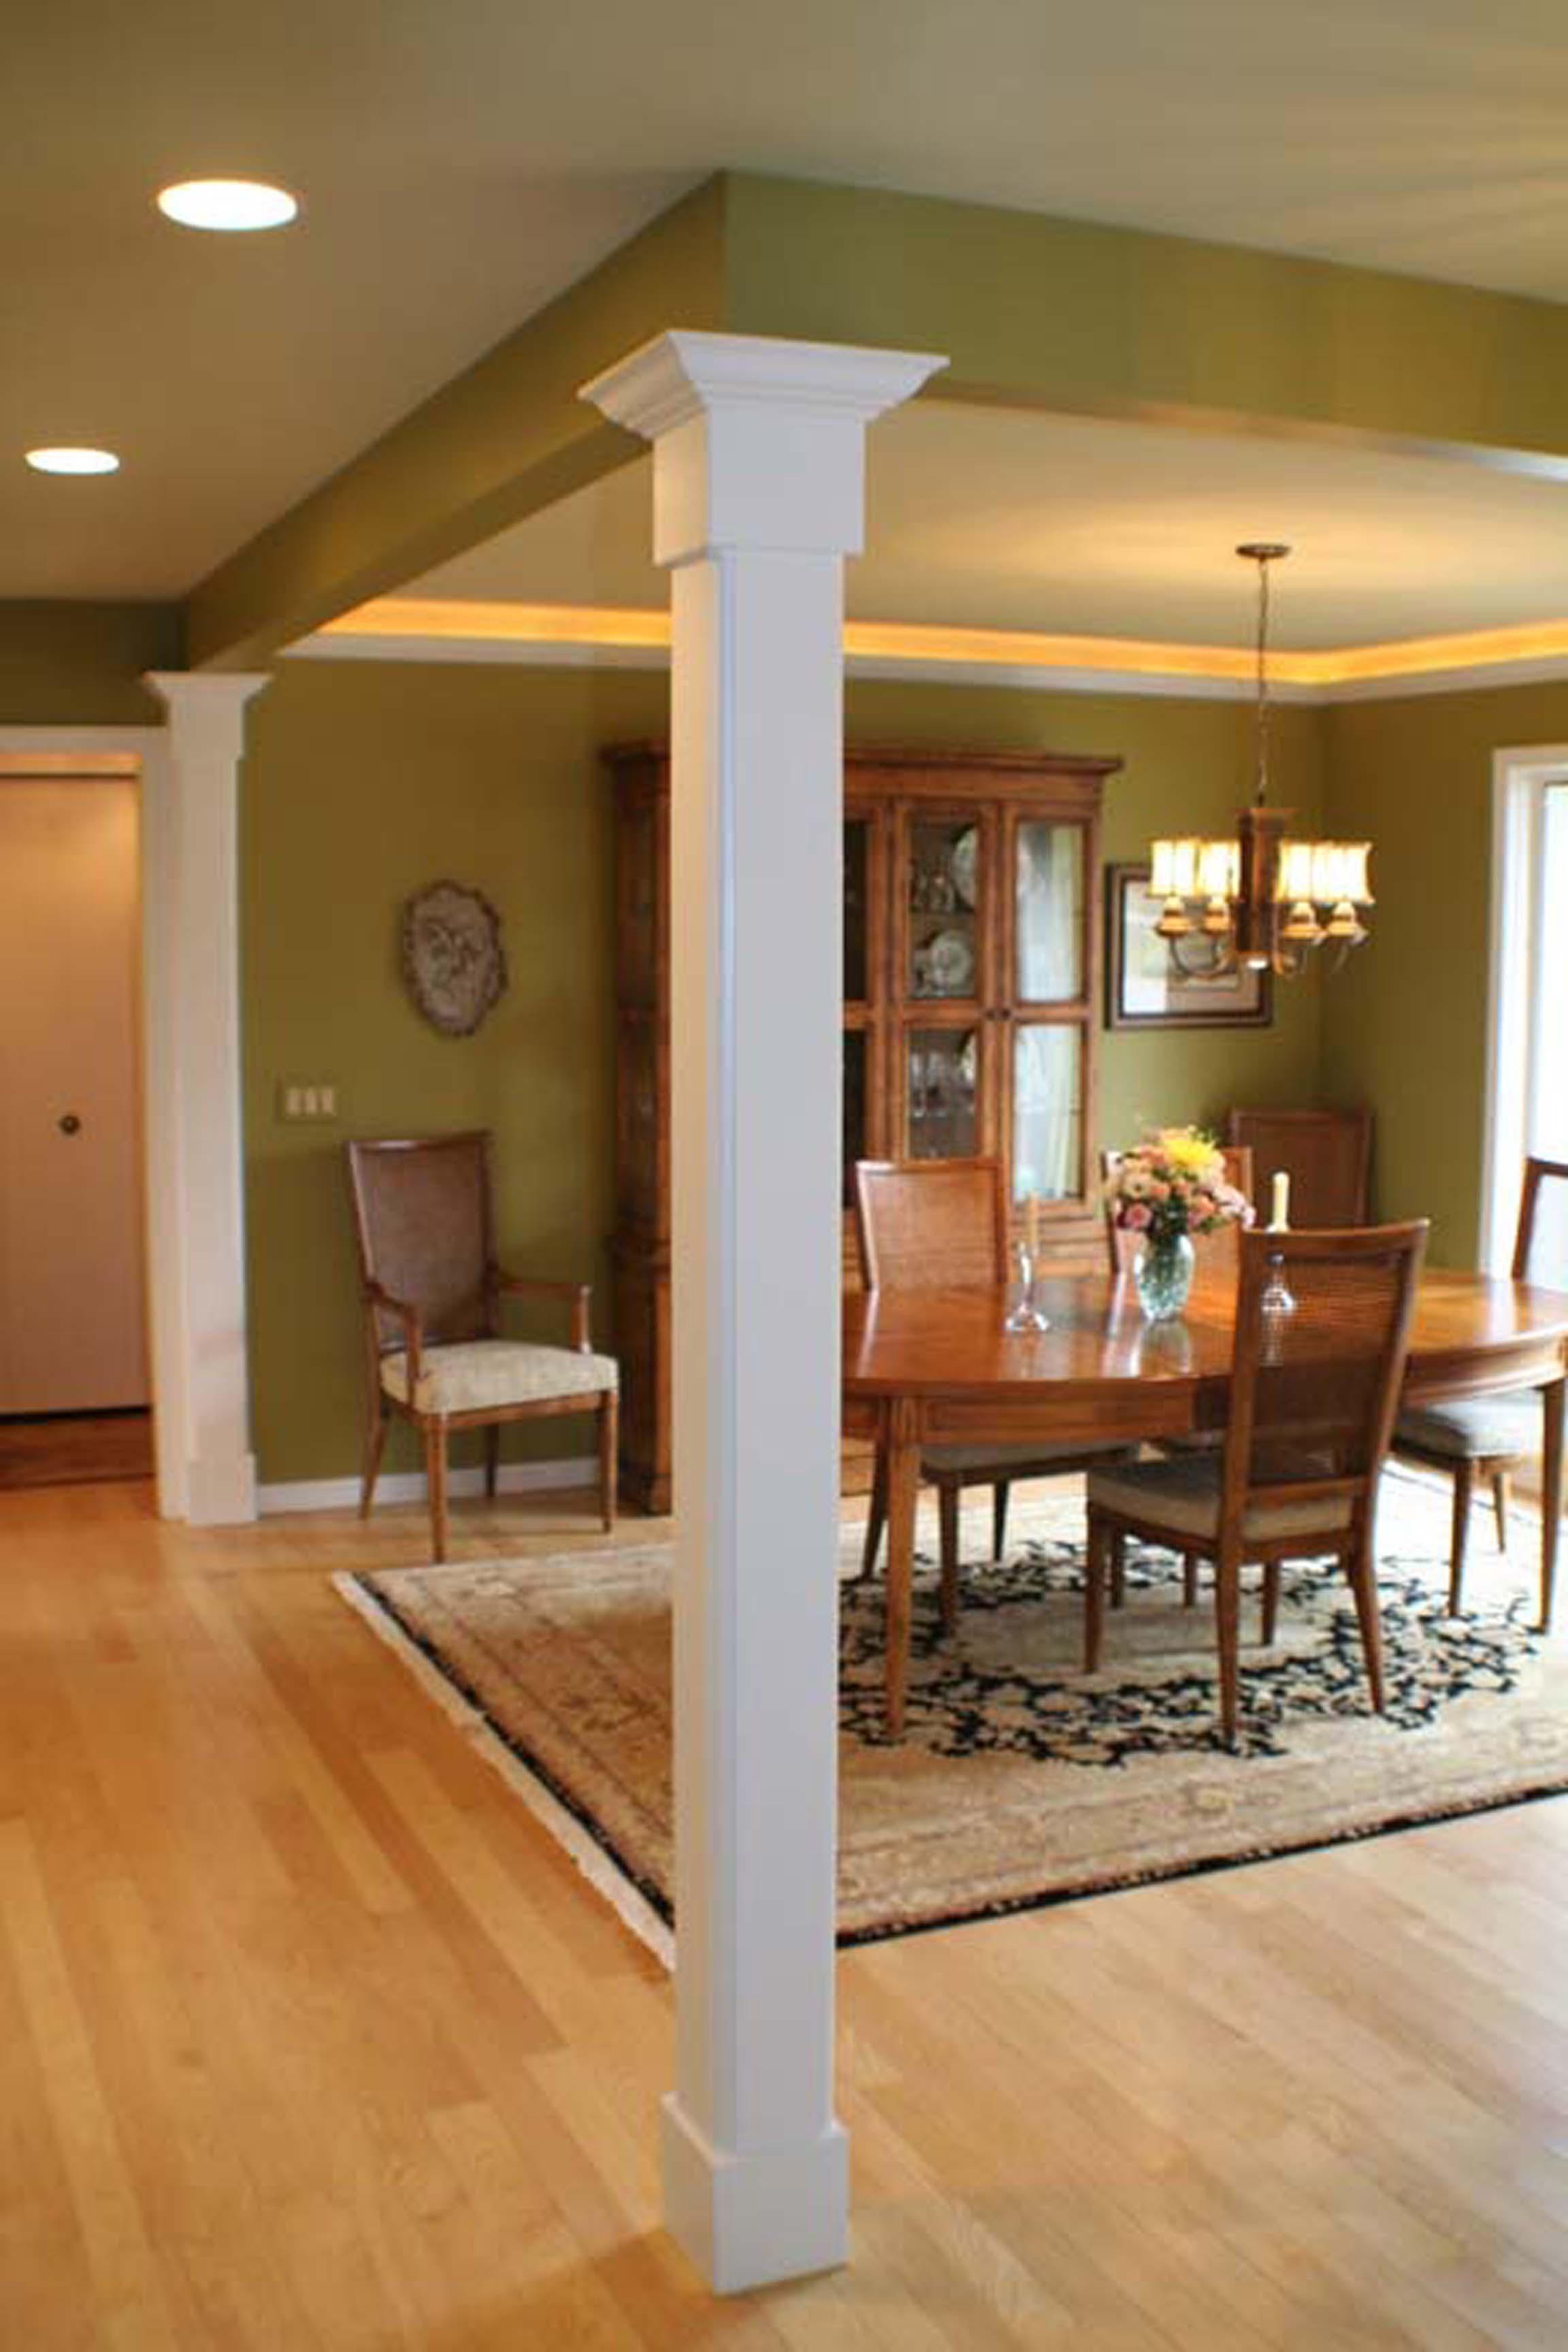 Interiors magnotta builders and remodelers - Pillars design in interiors ...